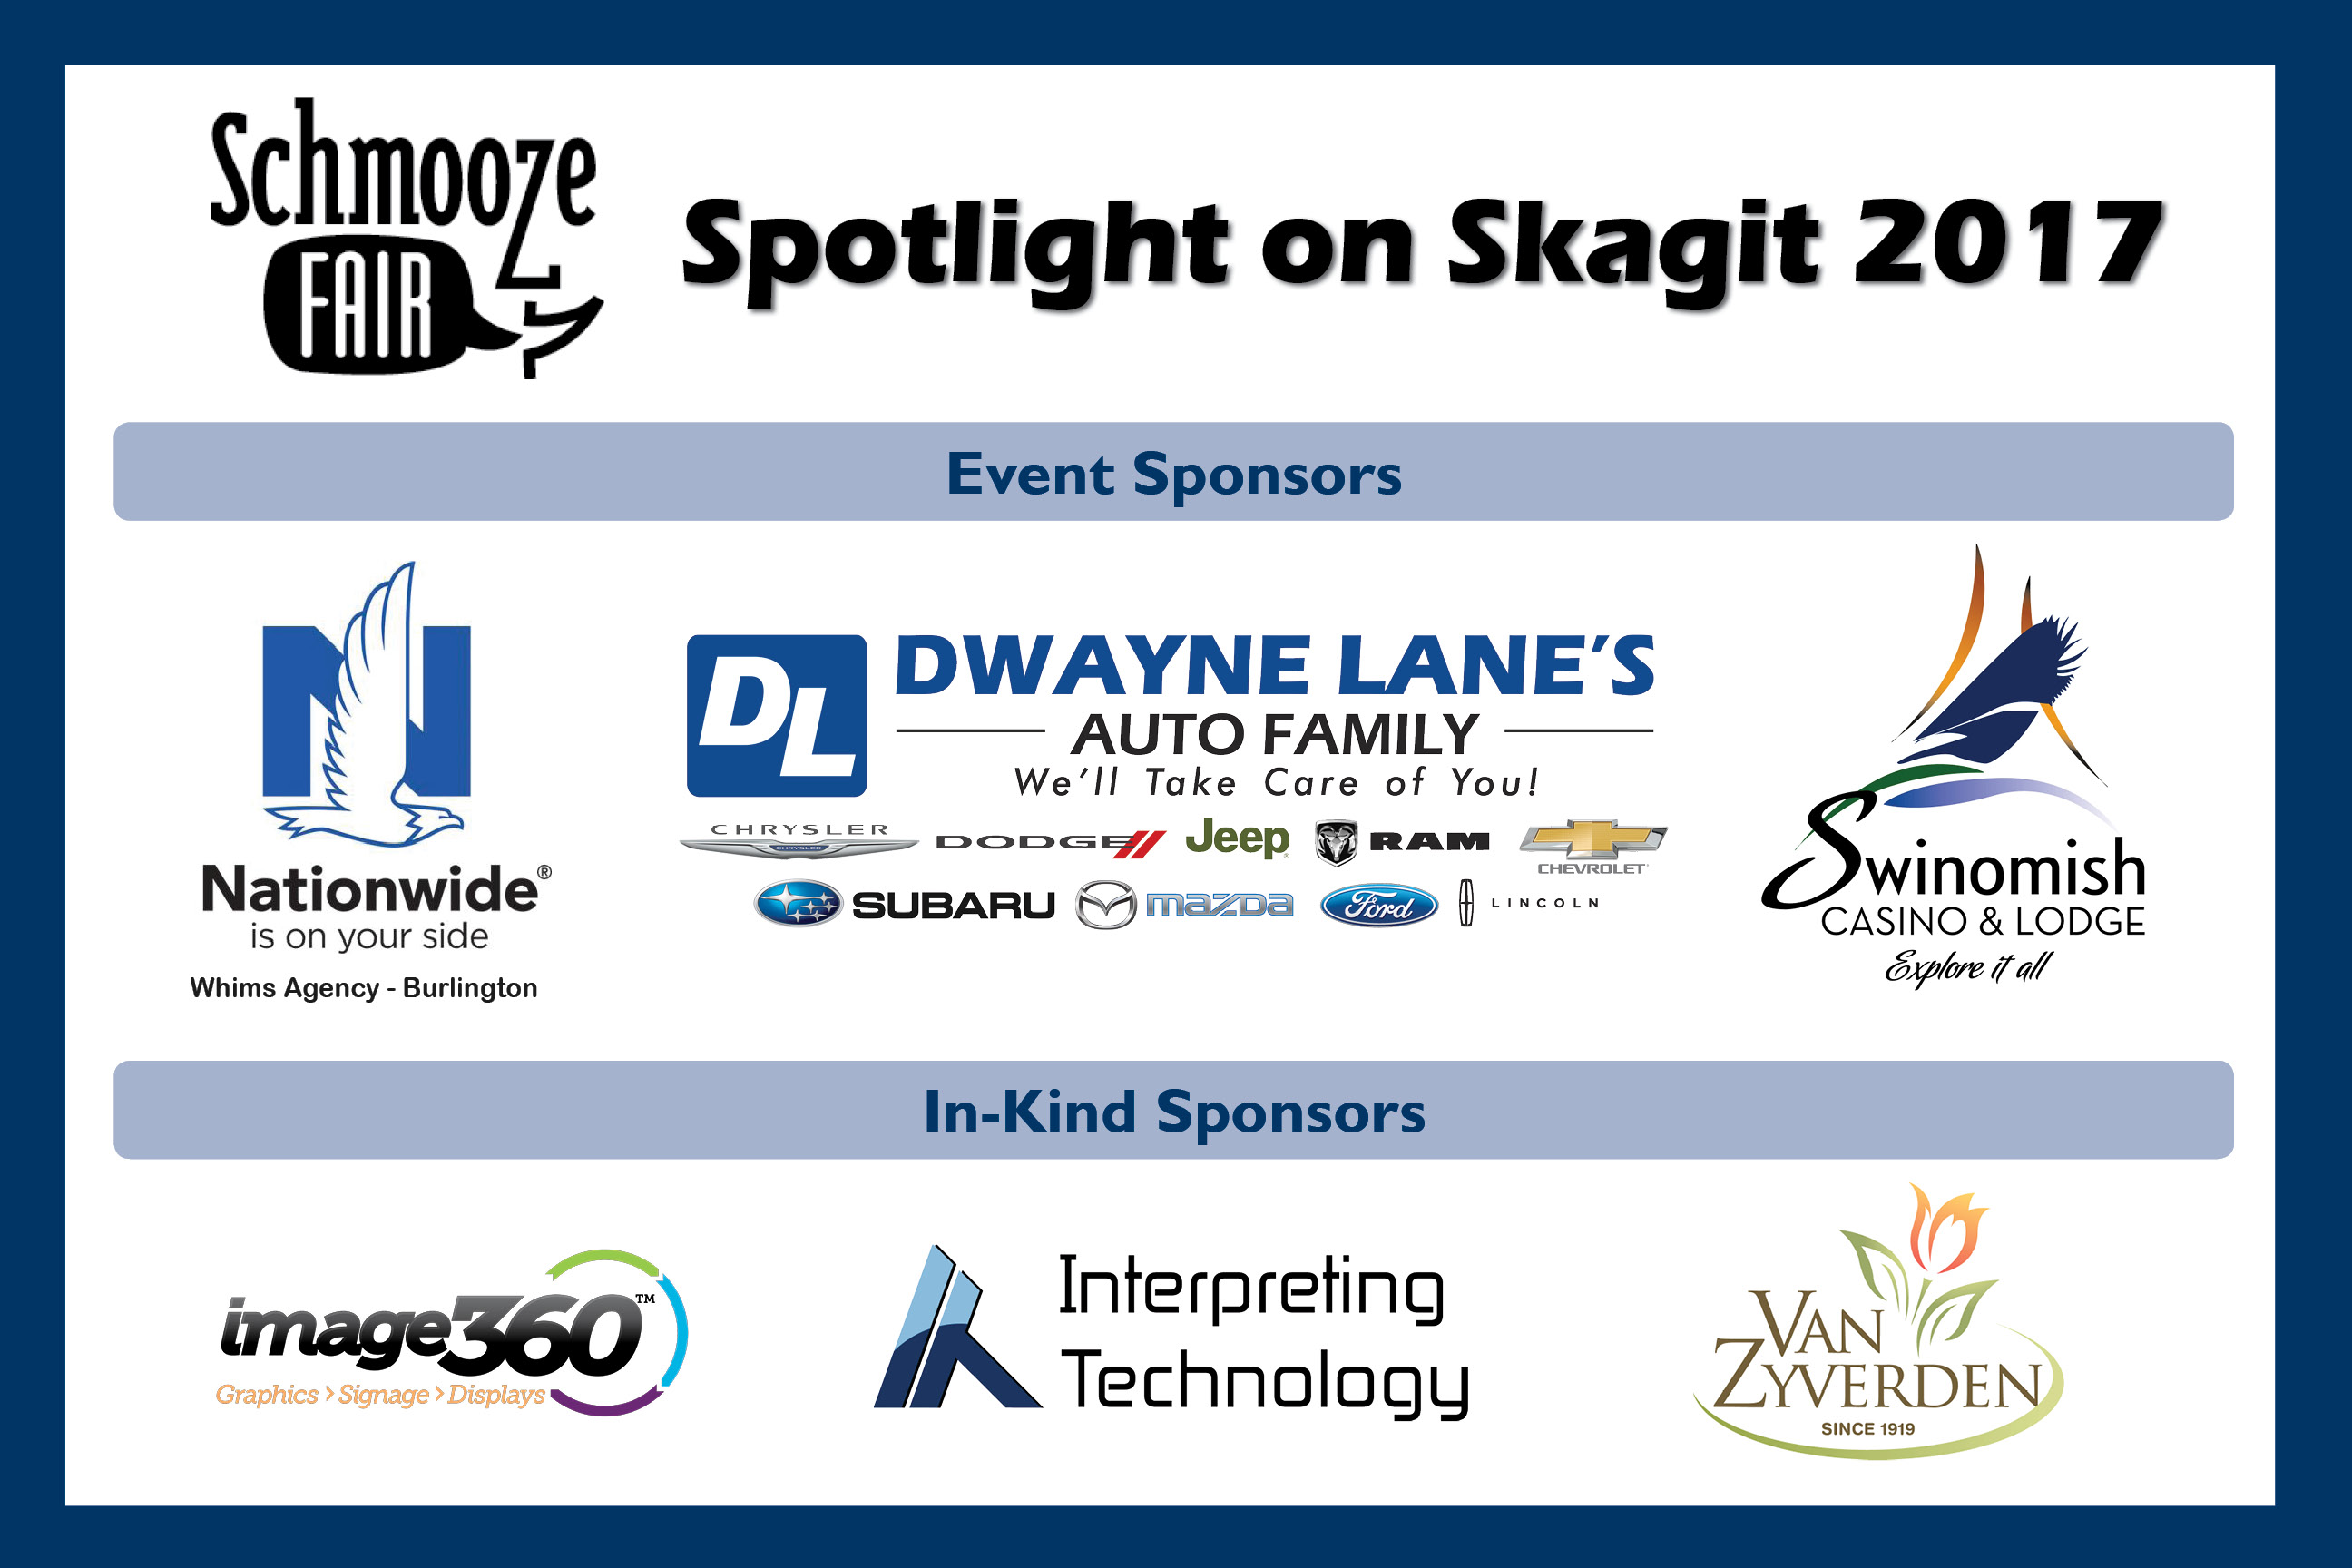 Schmooze Fair Spotlight on Skagit Tickets Thu Apr 6 2017 at 4 00